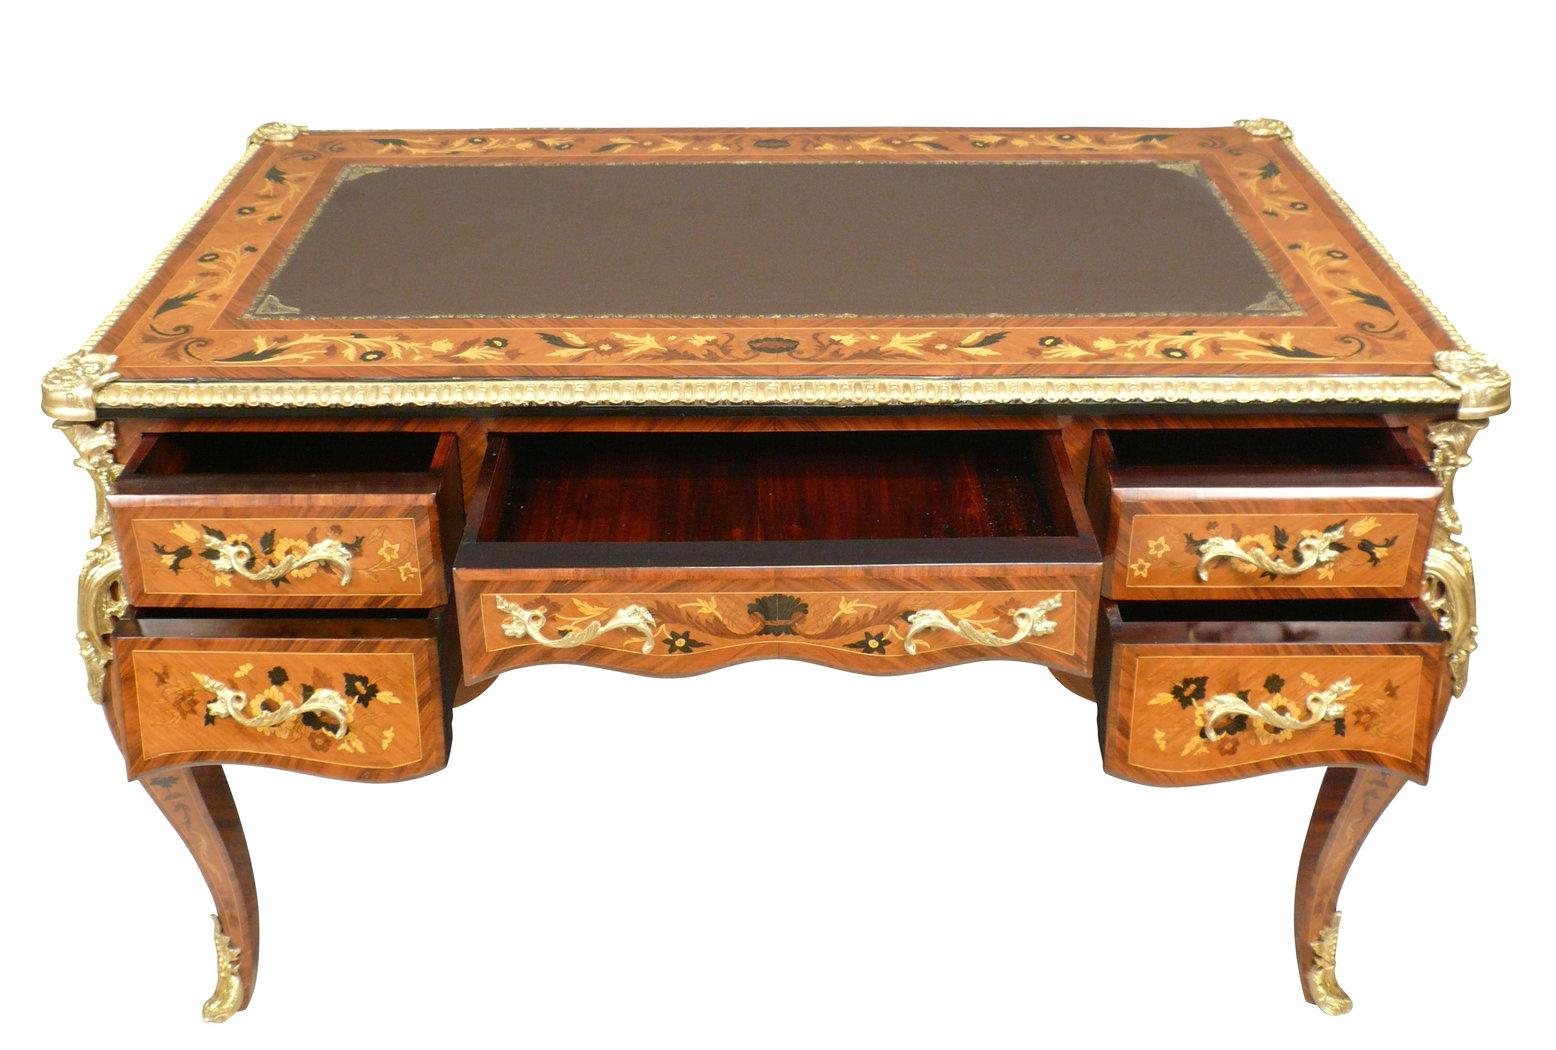 bureau louis xv vendre meuble louis xv. Black Bedroom Furniture Sets. Home Design Ideas